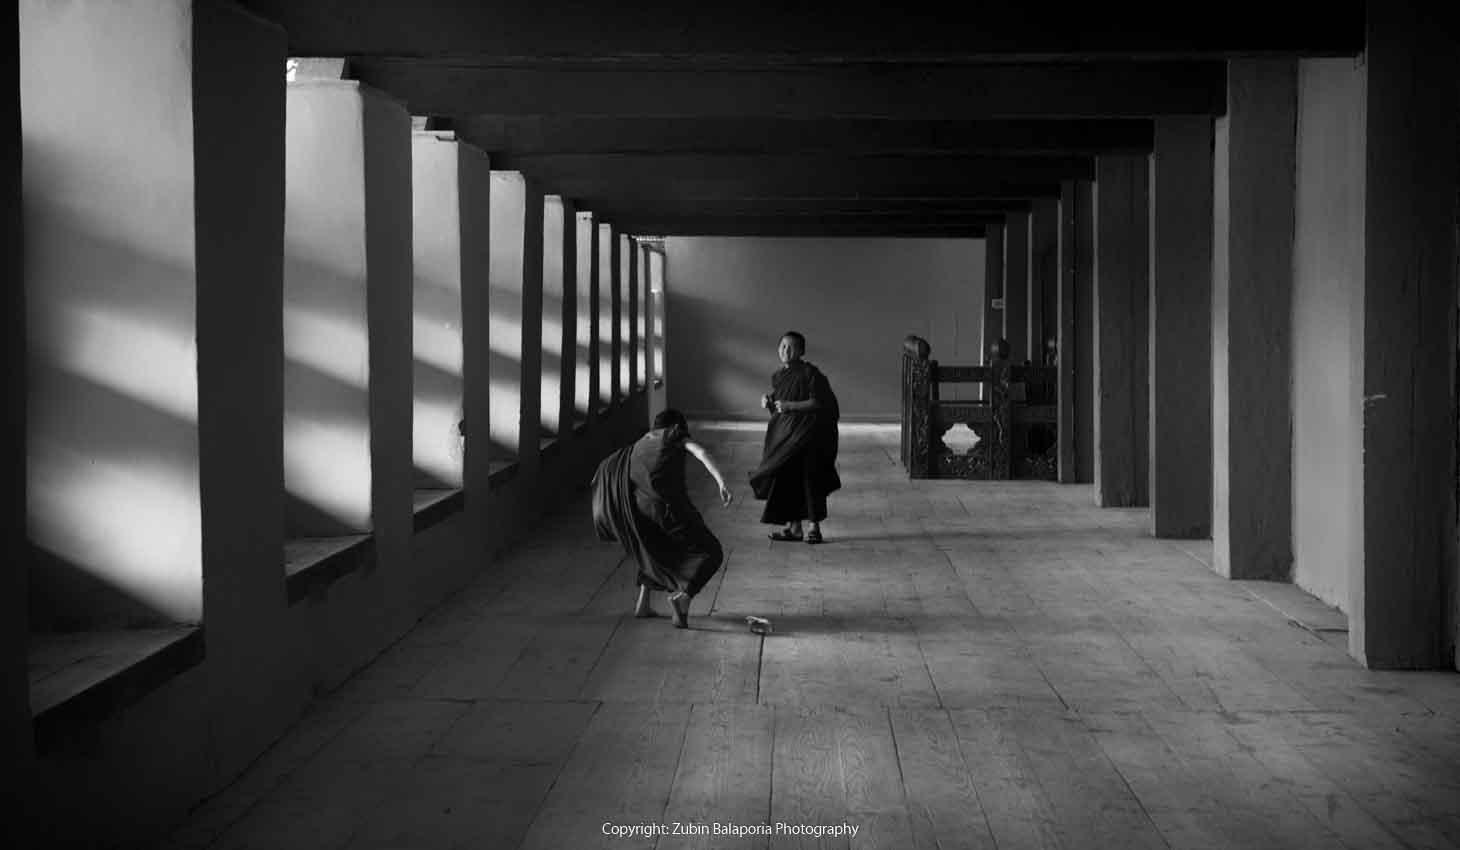 BHU Pillar Hall Monks 18 BW.jpg